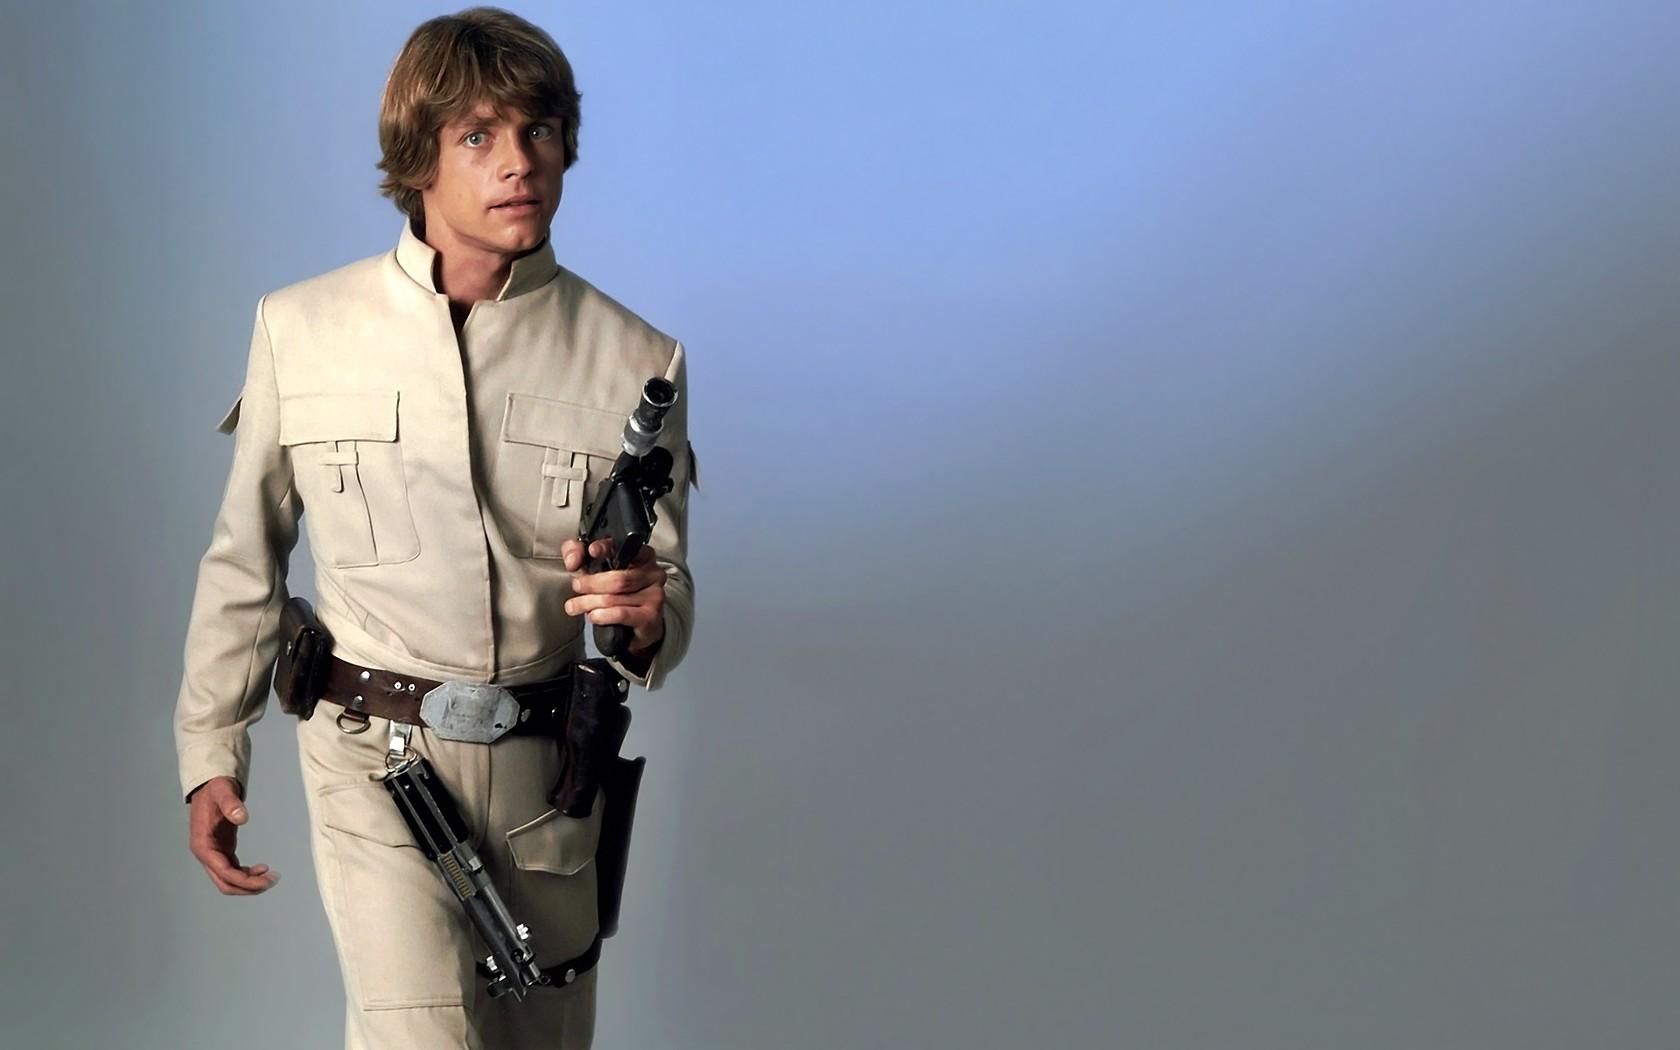 Wallpaper Star Wars Sky Luke Skywalker Mark Hamill Professional Shoulder 1680x1050 Px Outerwear Profession 1680x1050 Wallpaperup 784345 Hd Wallpapers Wallhere